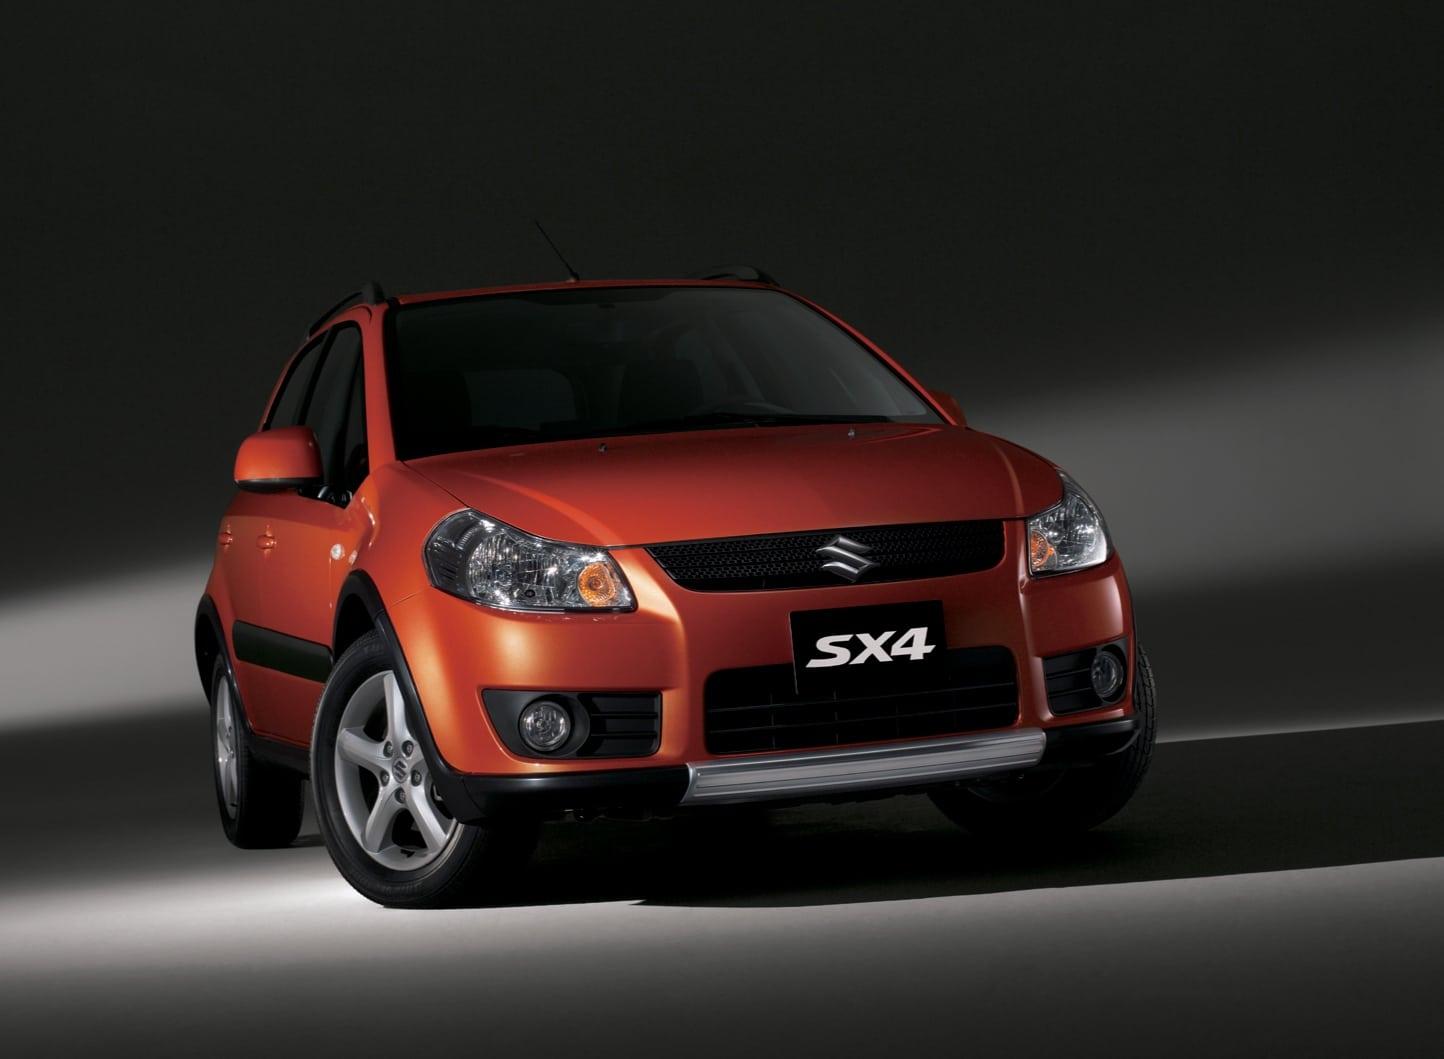 Suzuki, SX4, 4x4, Suzuki SX4, Vitara, Suzuki Vitara, off road, family car, crossover, SUV, buying guide, motoring, automotive, cars, classic ca, retro car, cheap car, car sales, not2grand, www.not2grand.co.uk, car, cars, motoring, featured